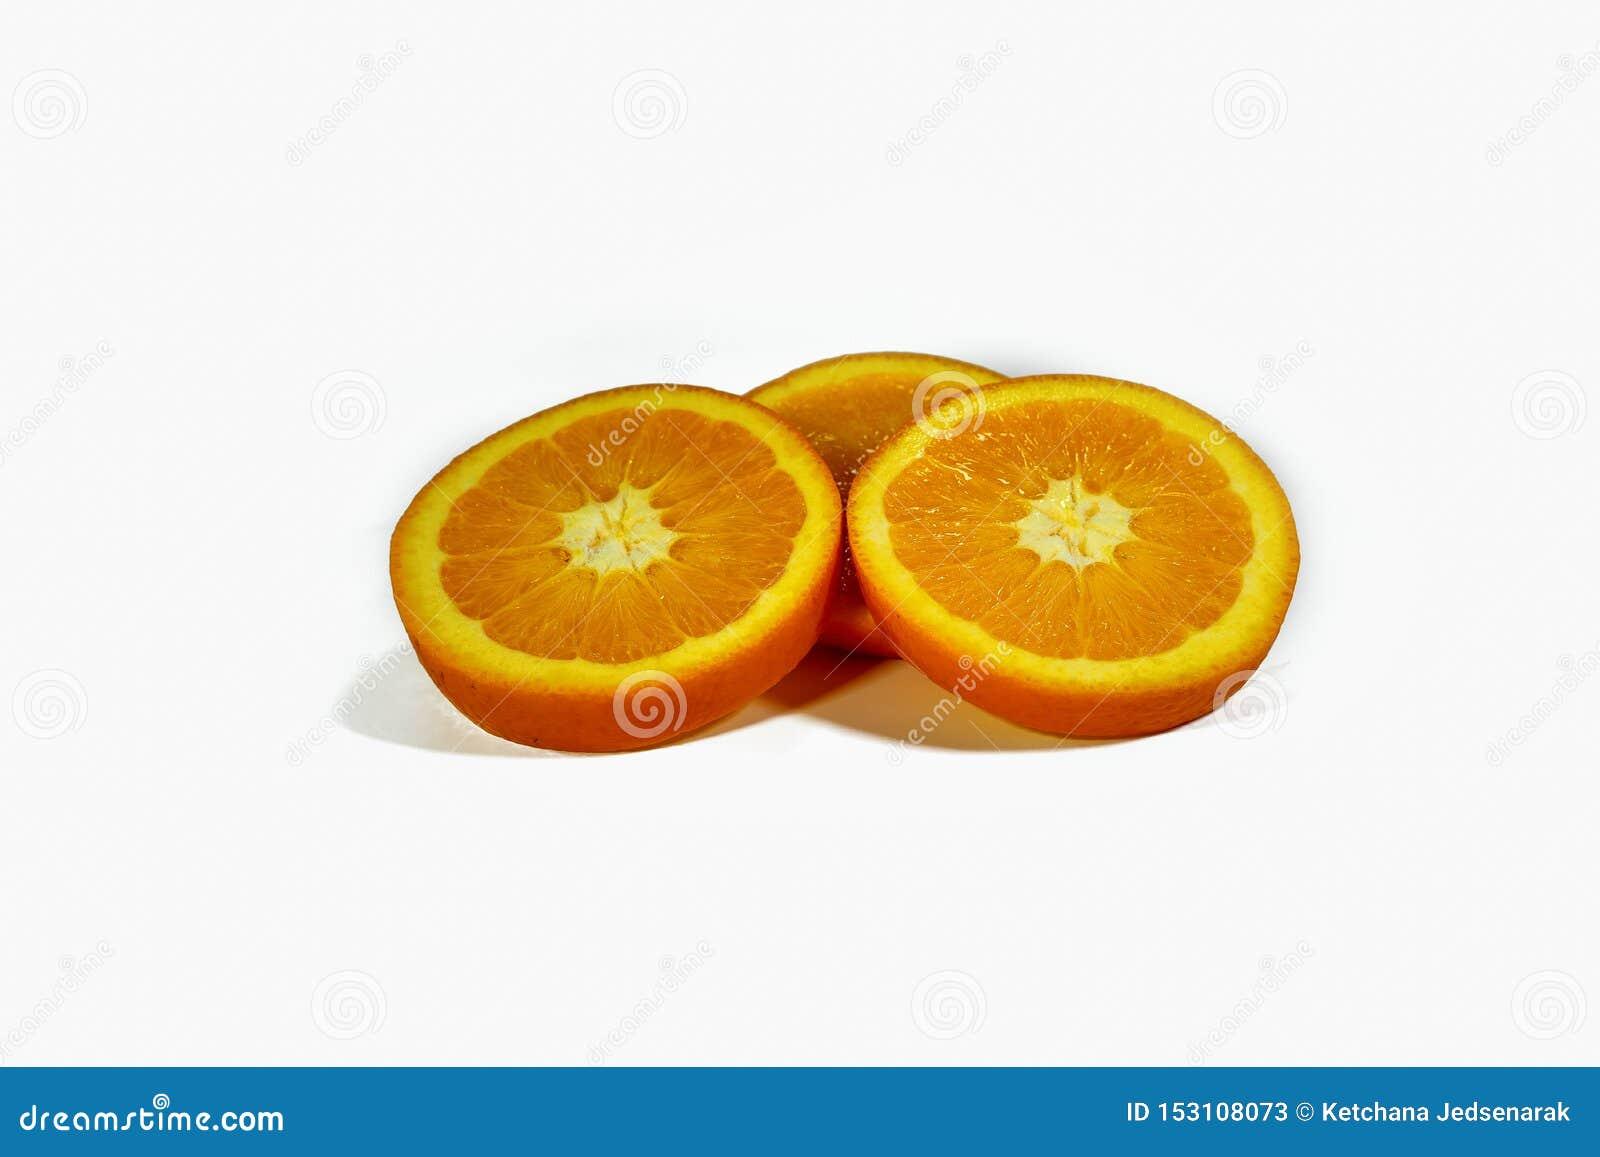 Skivade orange skivor som staplas isolerat på en vit bakgrund